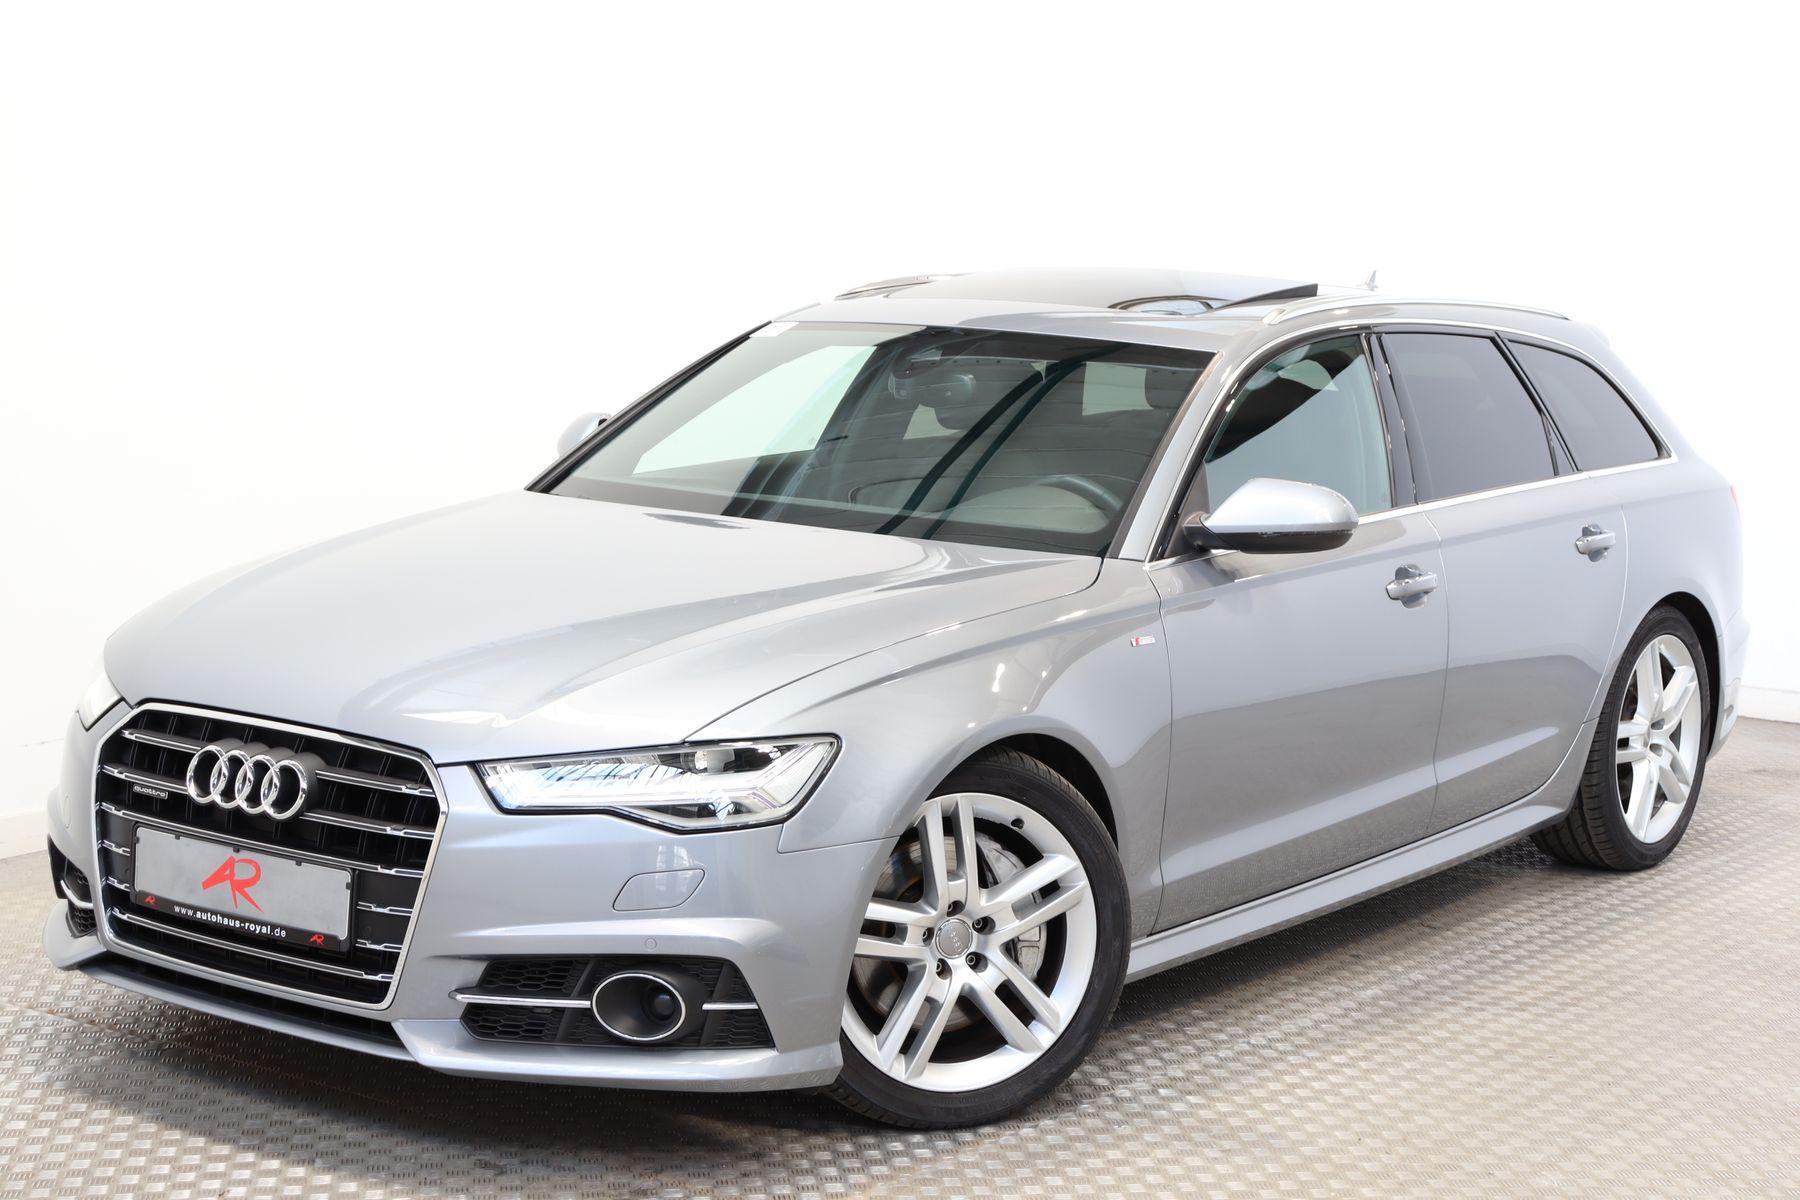 Audi A6 Avant 3.0 TDI qu S LINE SELECTION KAMERA,ACC, Jahr 2017, Diesel